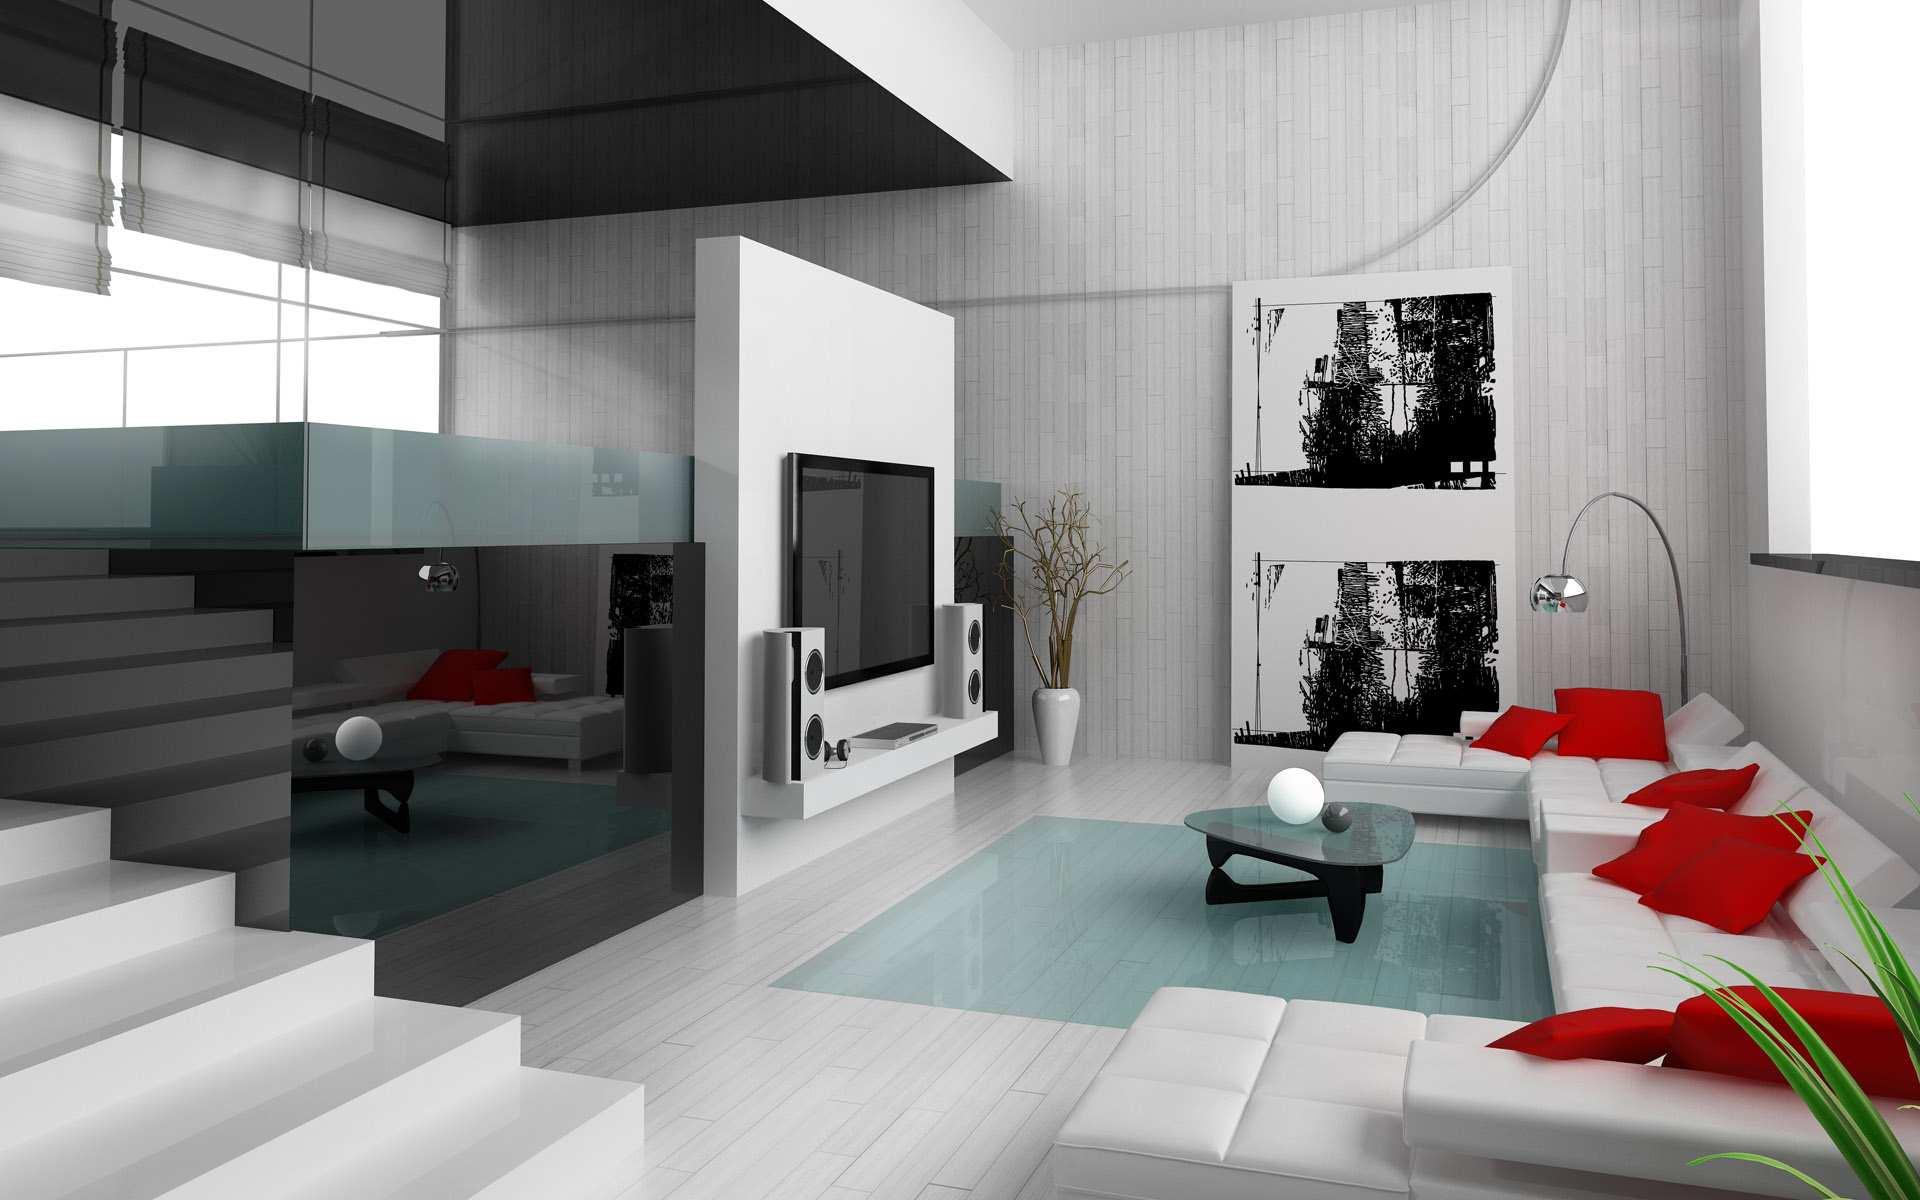 Elegant Black and White Interior Design Concept Sambeng Home Interior with Modern  Interior modern interior design concept